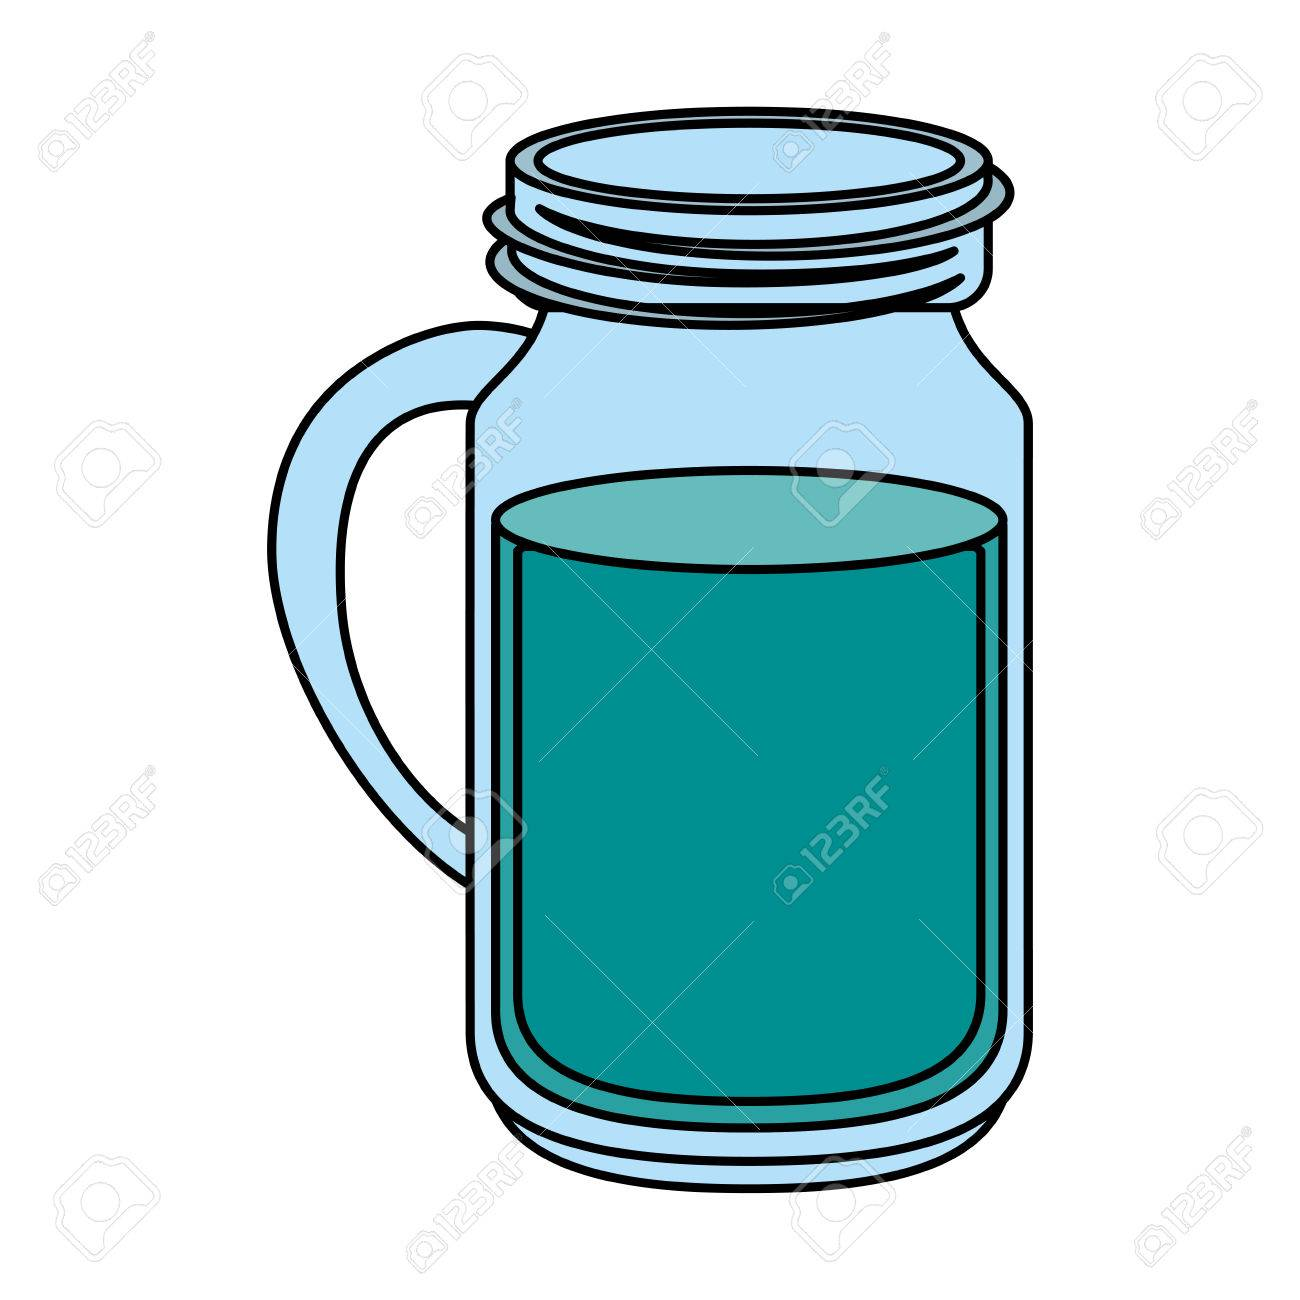 Water Bottle Clipart #53499 - Illustration by David Barnard